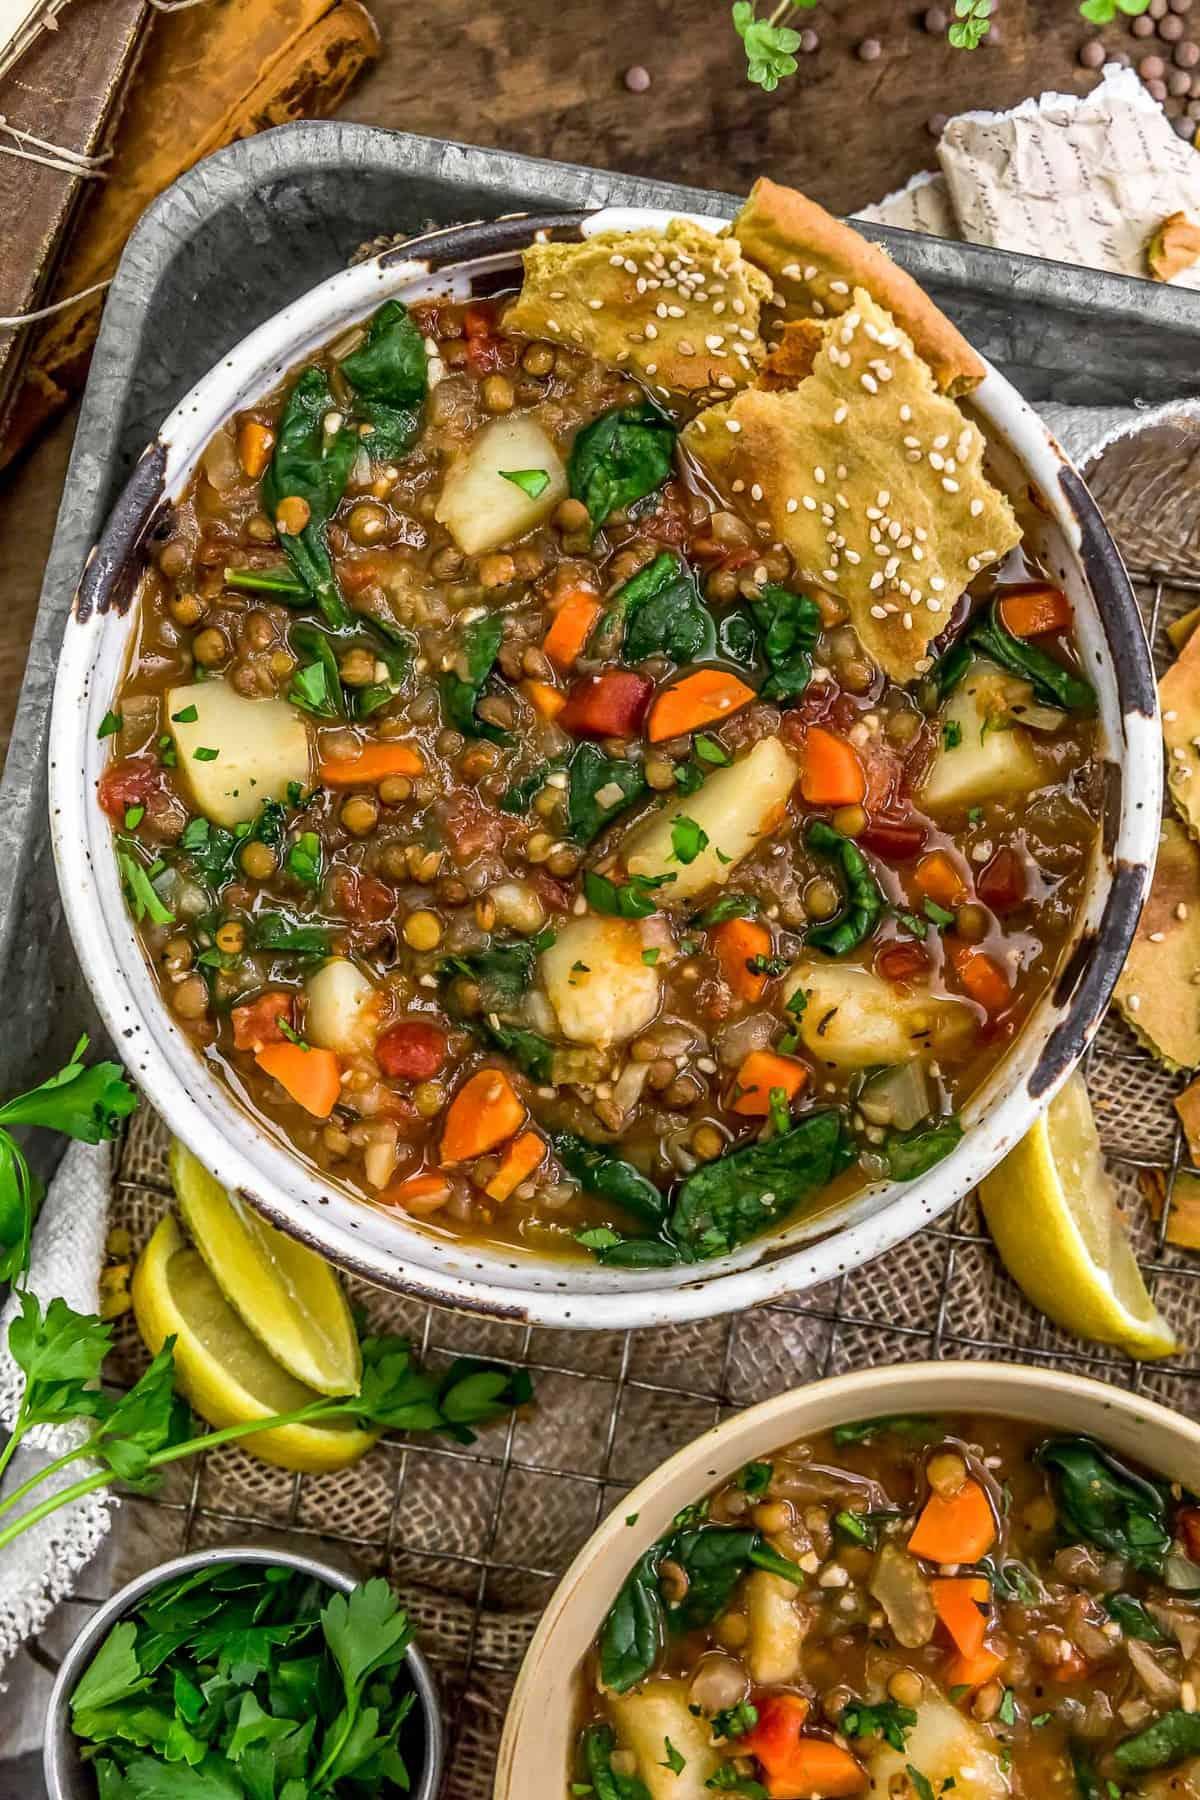 Bowls of Lemony Thyme Lentil Soup